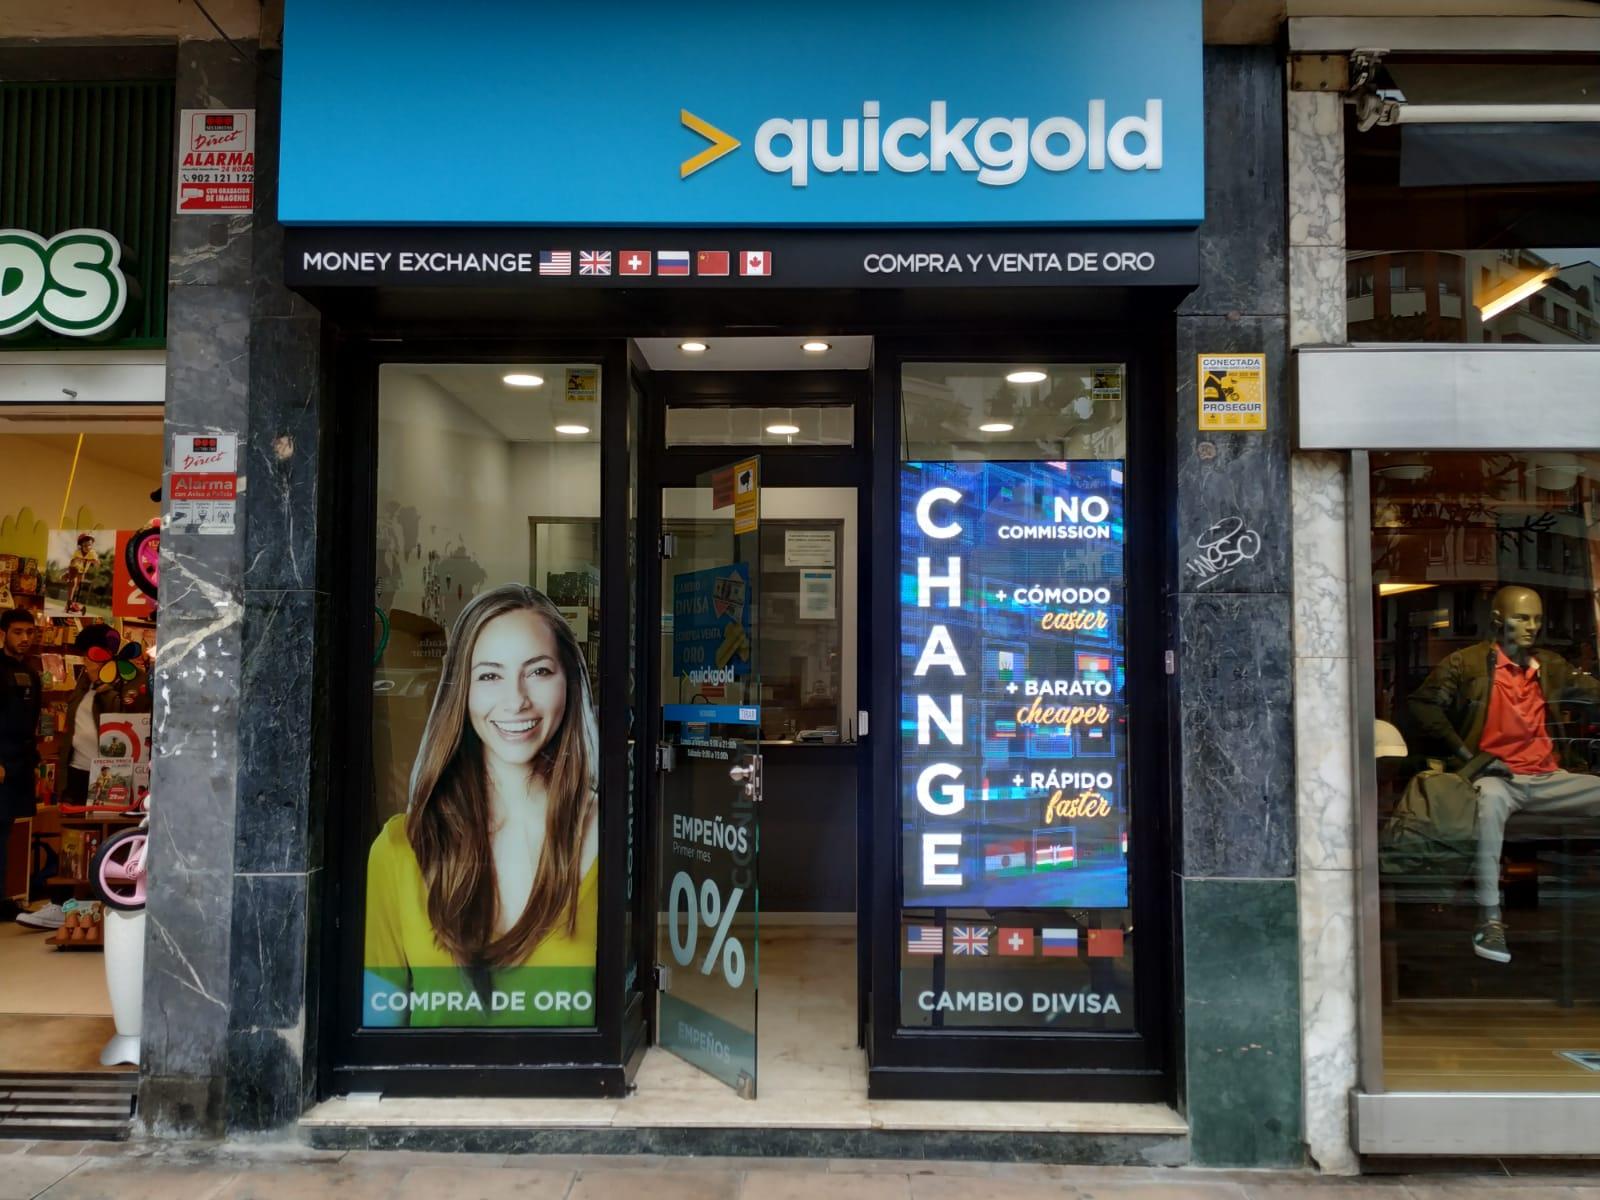 Tienda Quickgold Bilbao